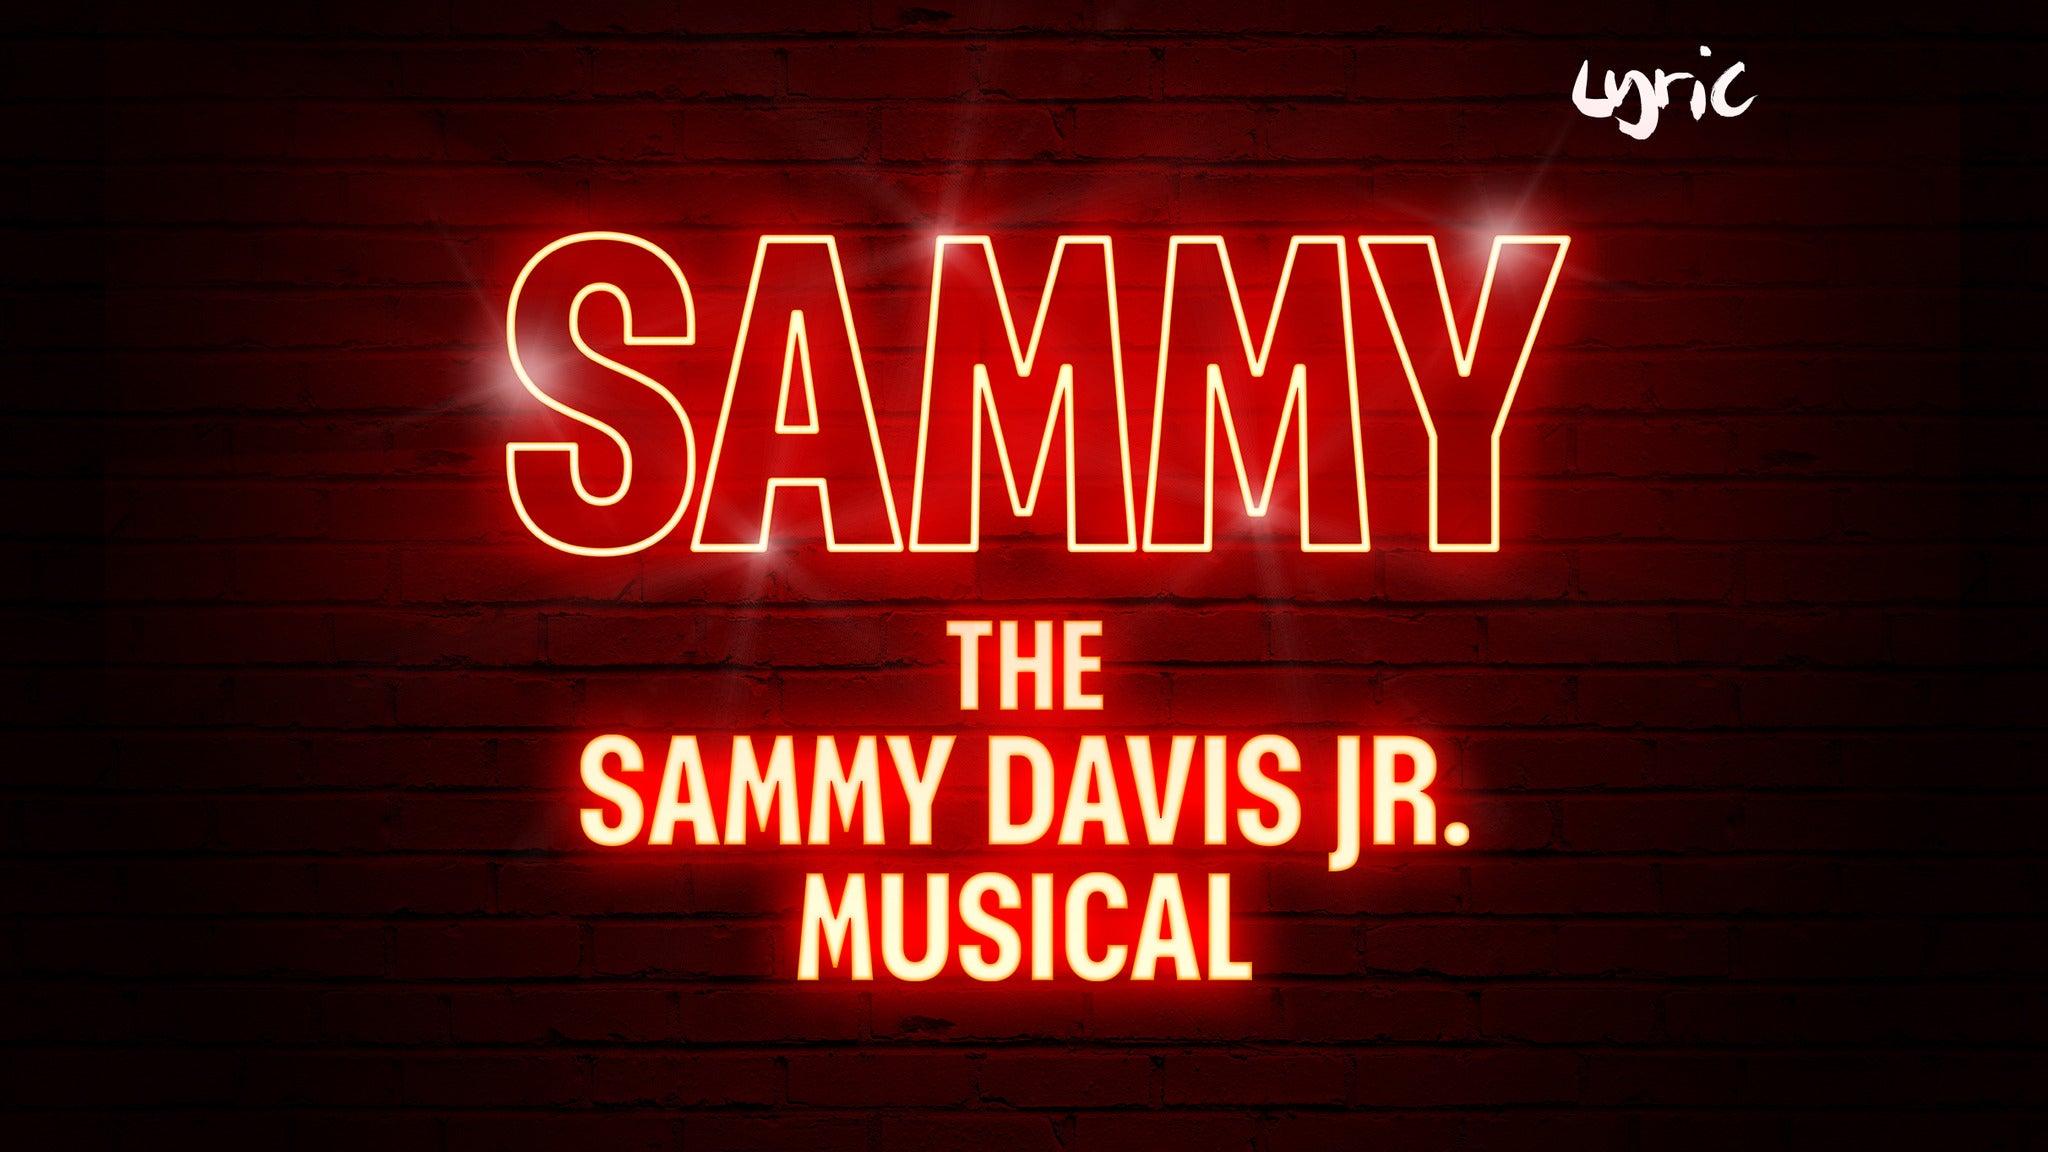 Sammy, The Sammy Davis Jr Musical